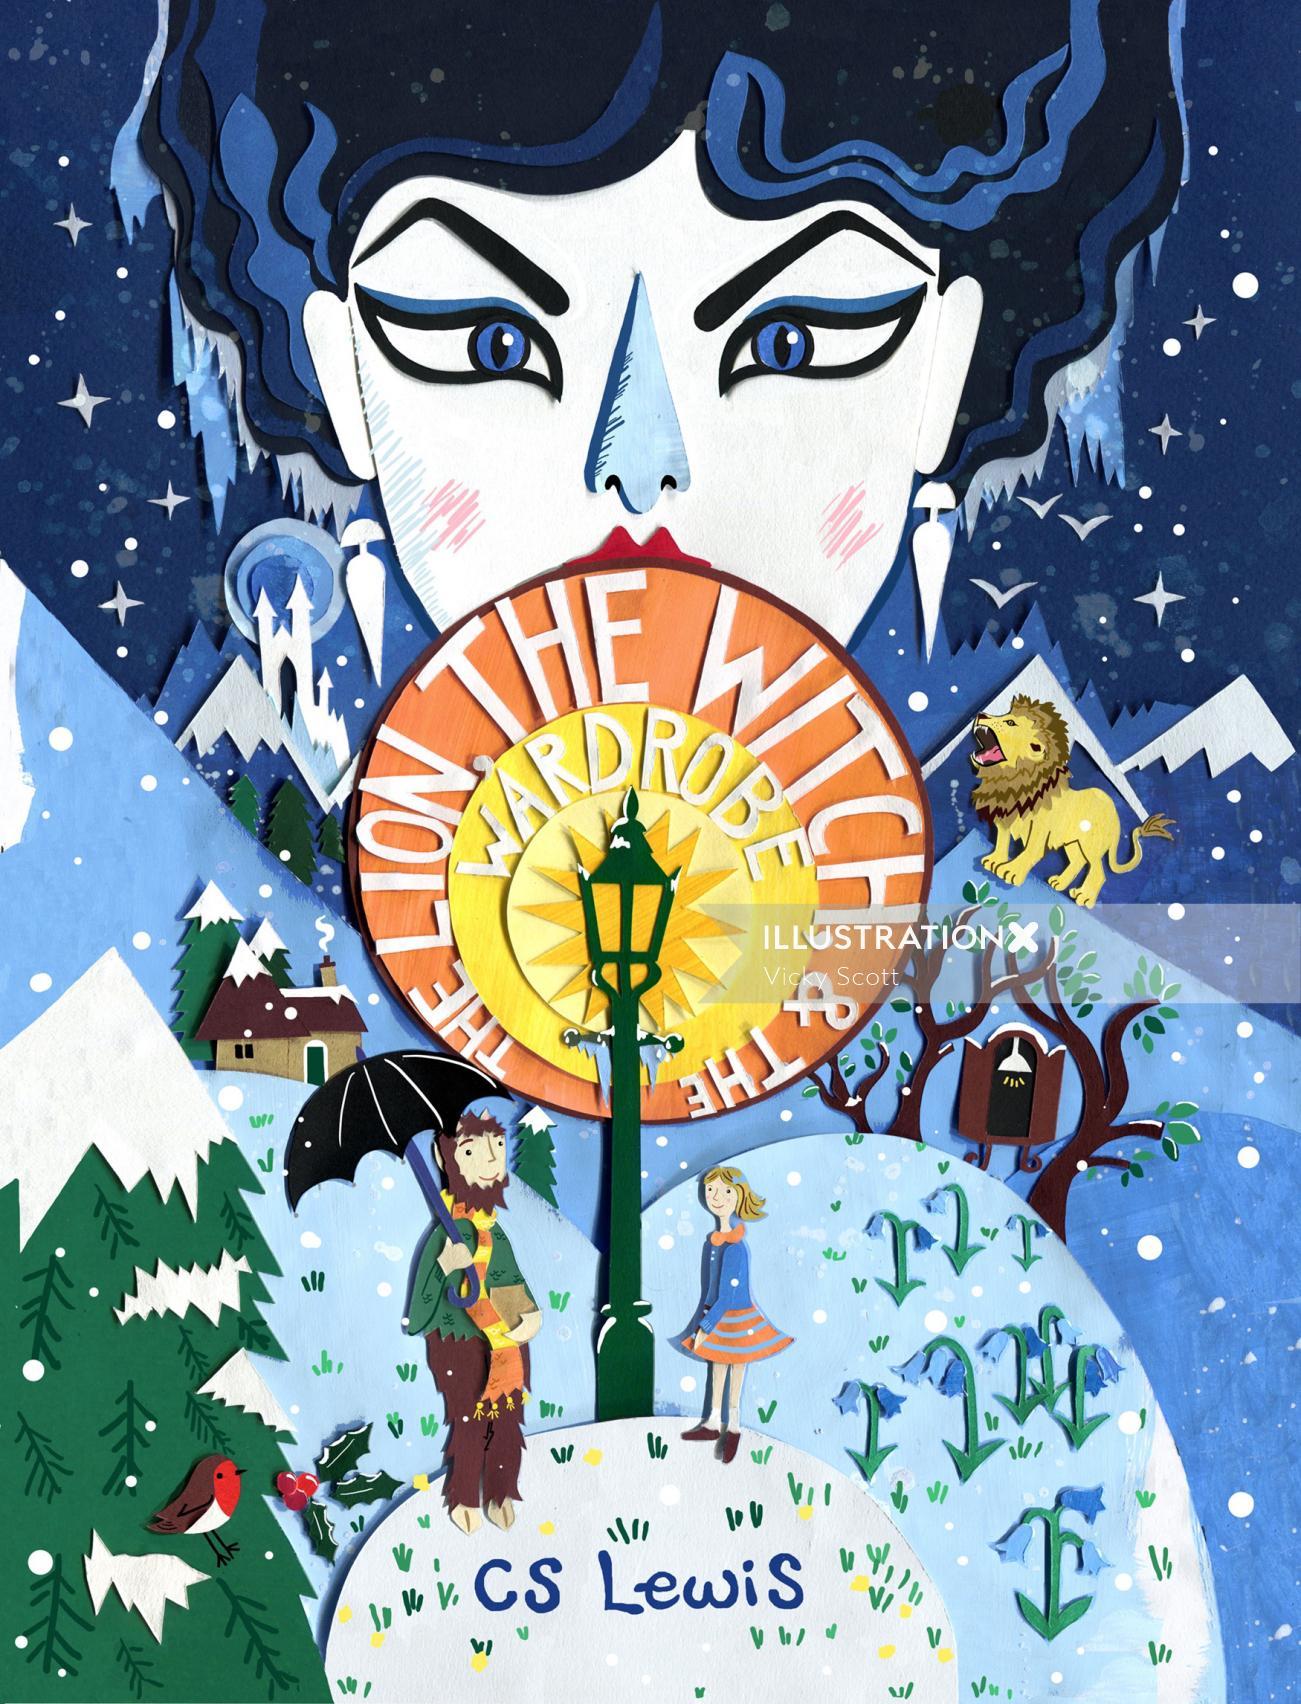 childrens book, snow, winter scene, book cover, cs lewis, lion, witch, children, fantasy, robin, blu